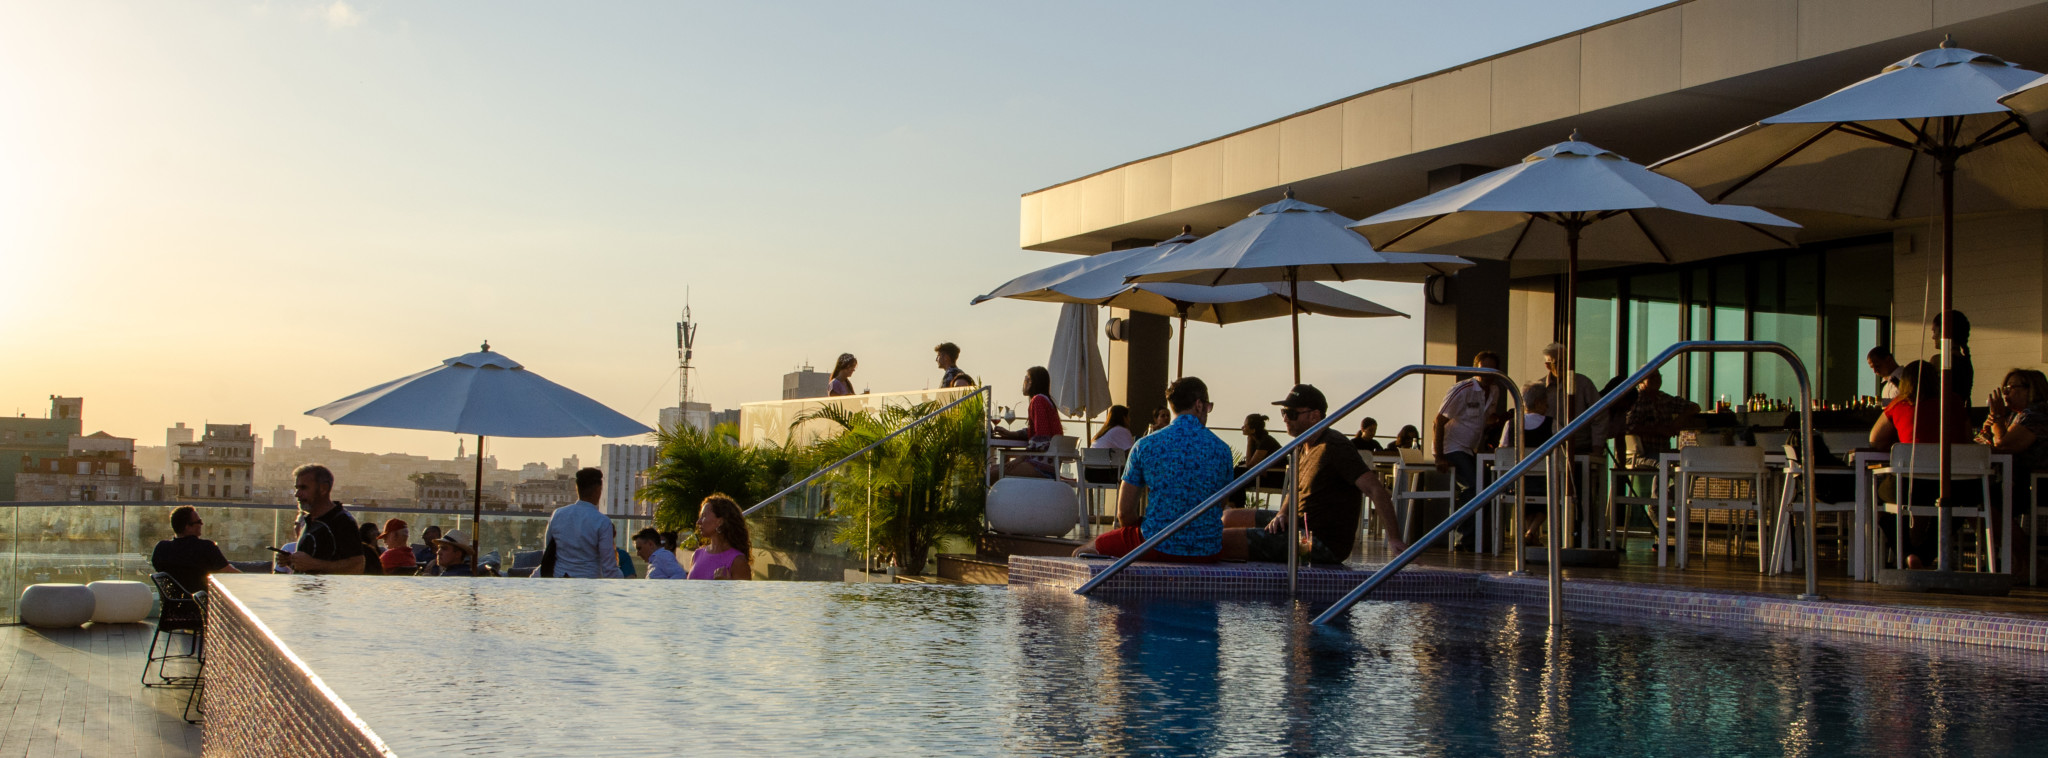 Dachterrasse Kempinski Hotel Havanna